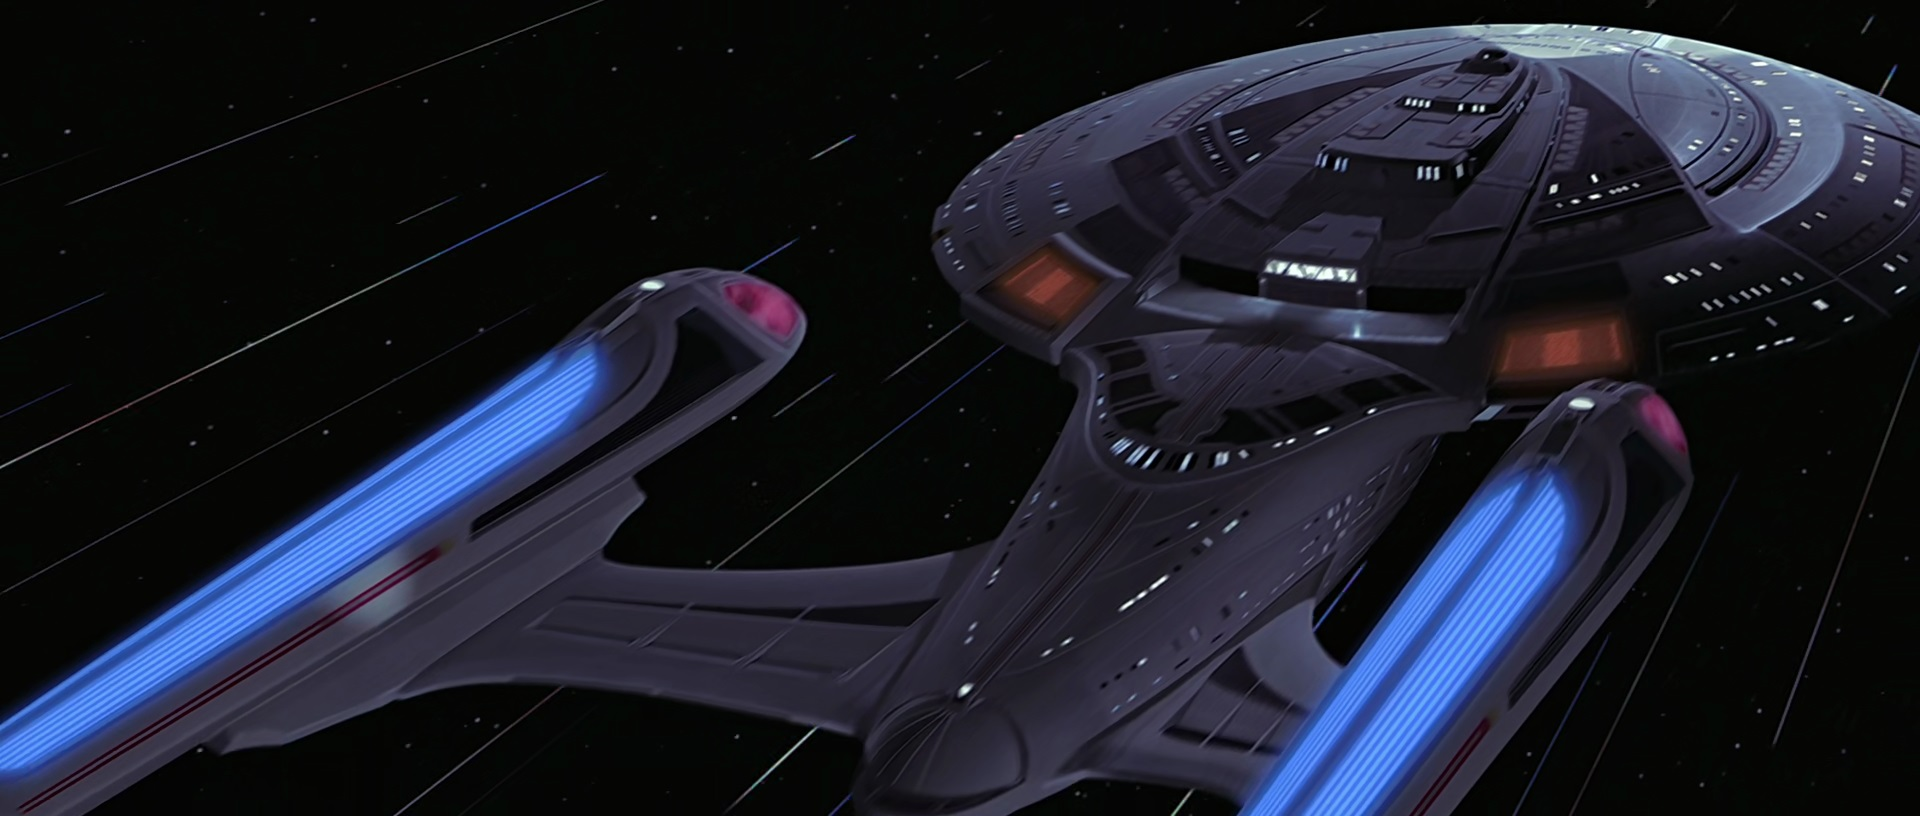 File:USS Enterprise-E at warp.jpg